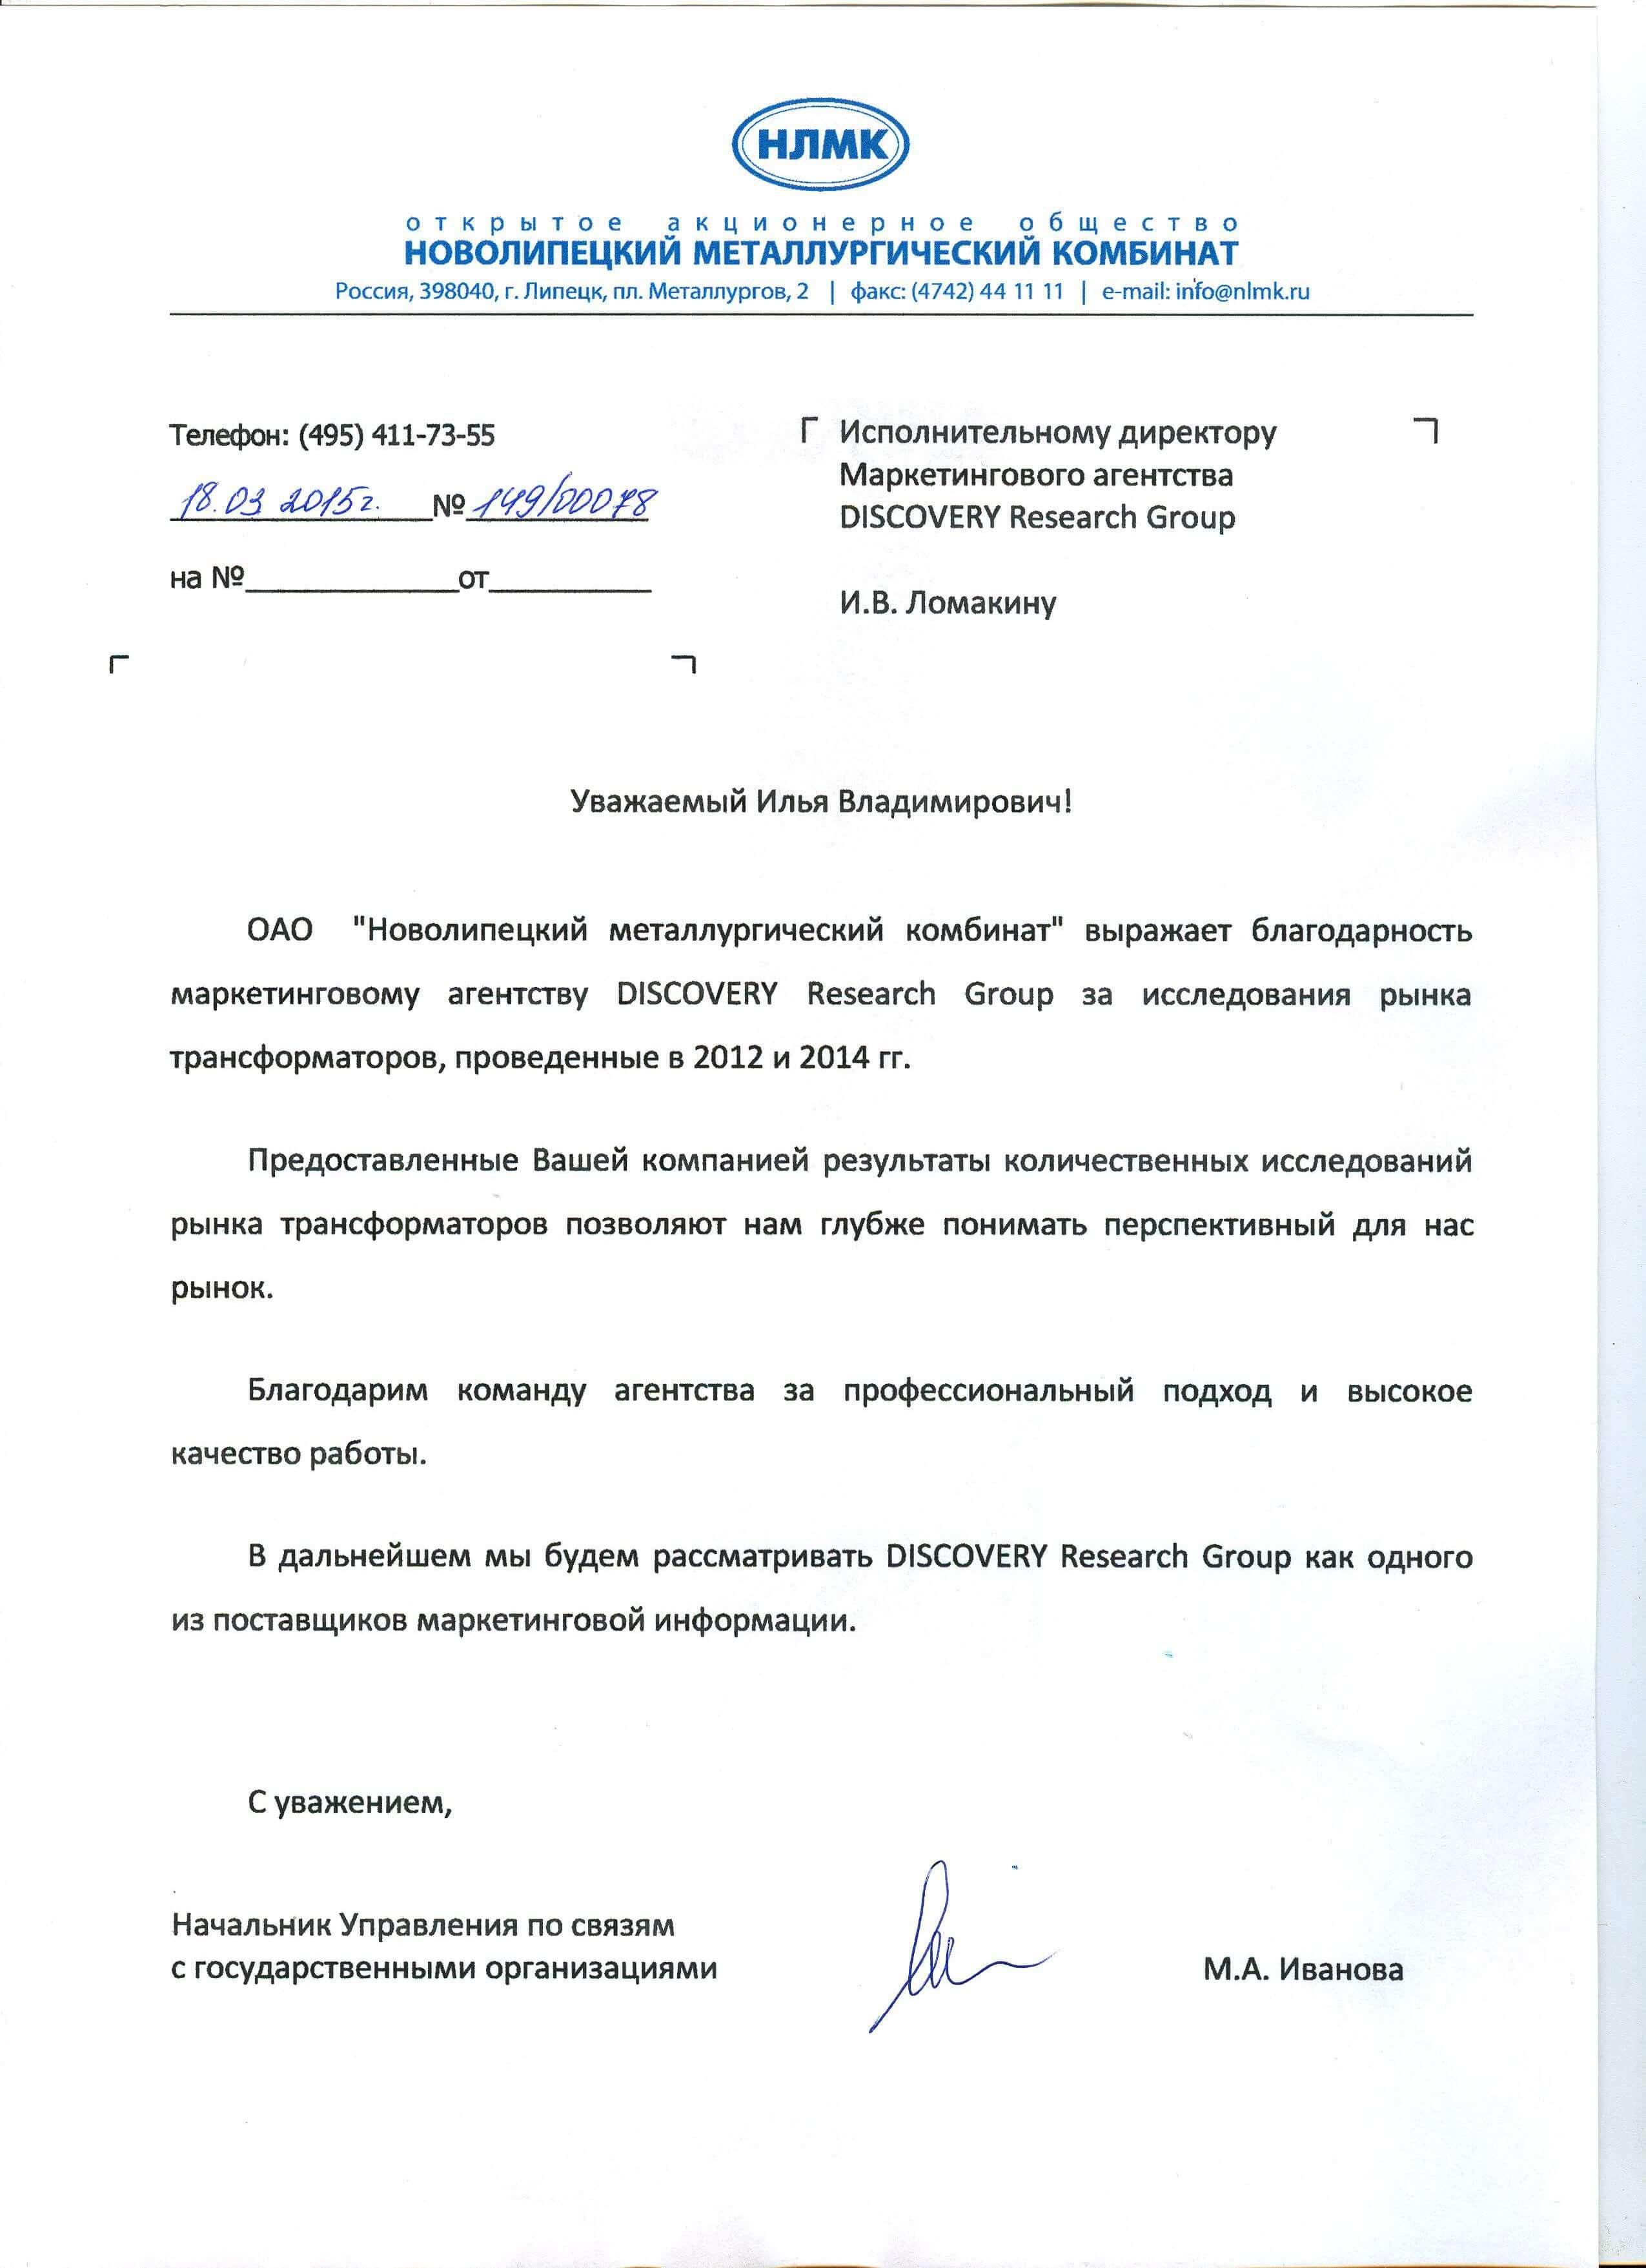 http://drgroup.ru/images/otzivi/lipetskii.jpg